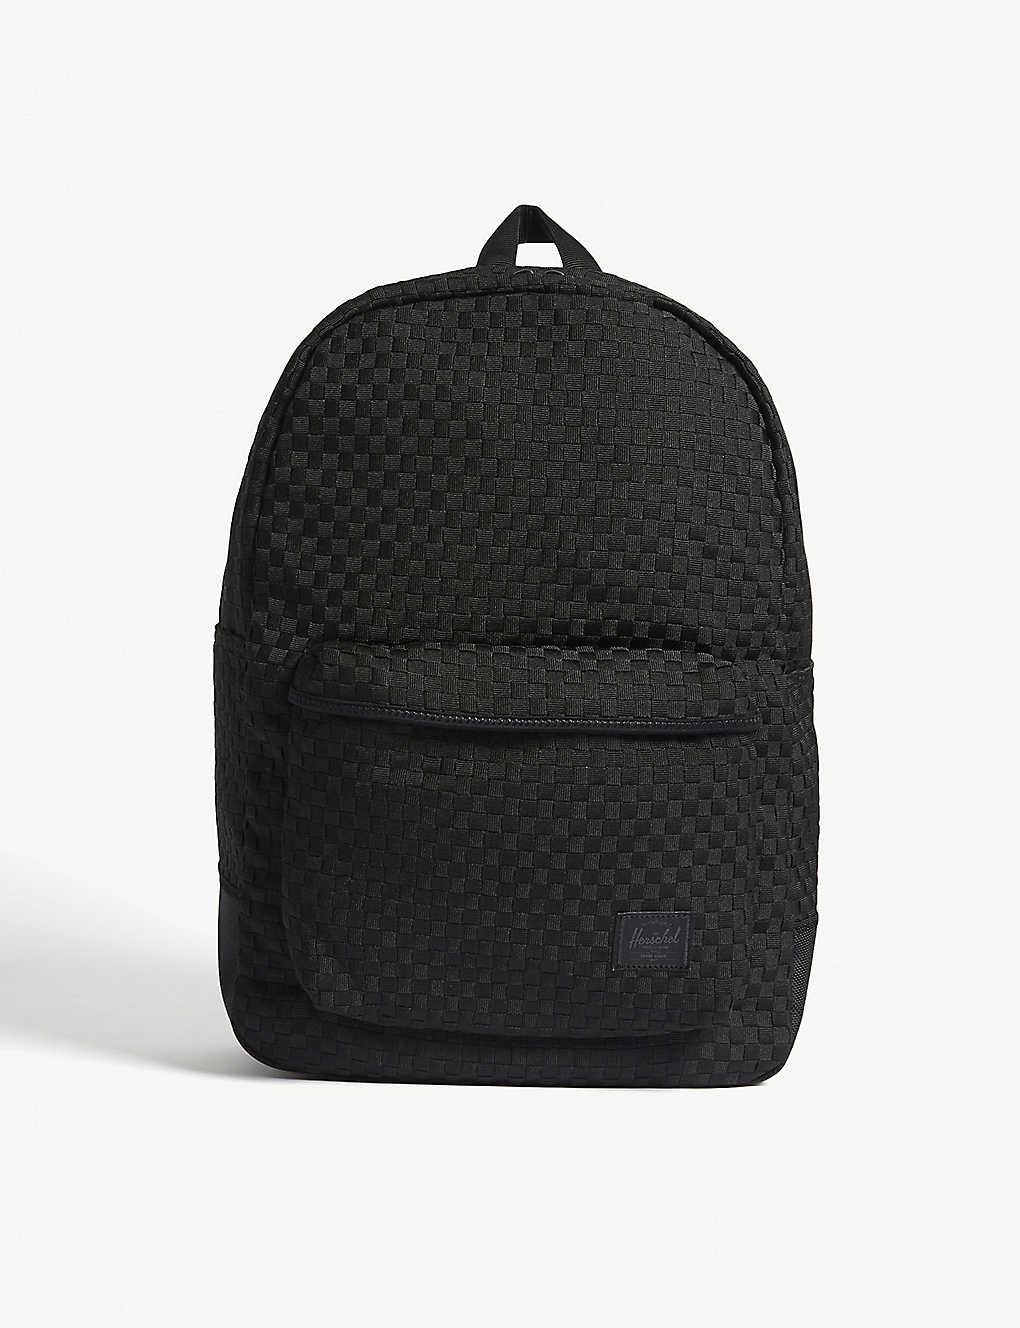 e2bb925e3f5 HERSCHEL SUPPLY CO - Lawson woven backpack